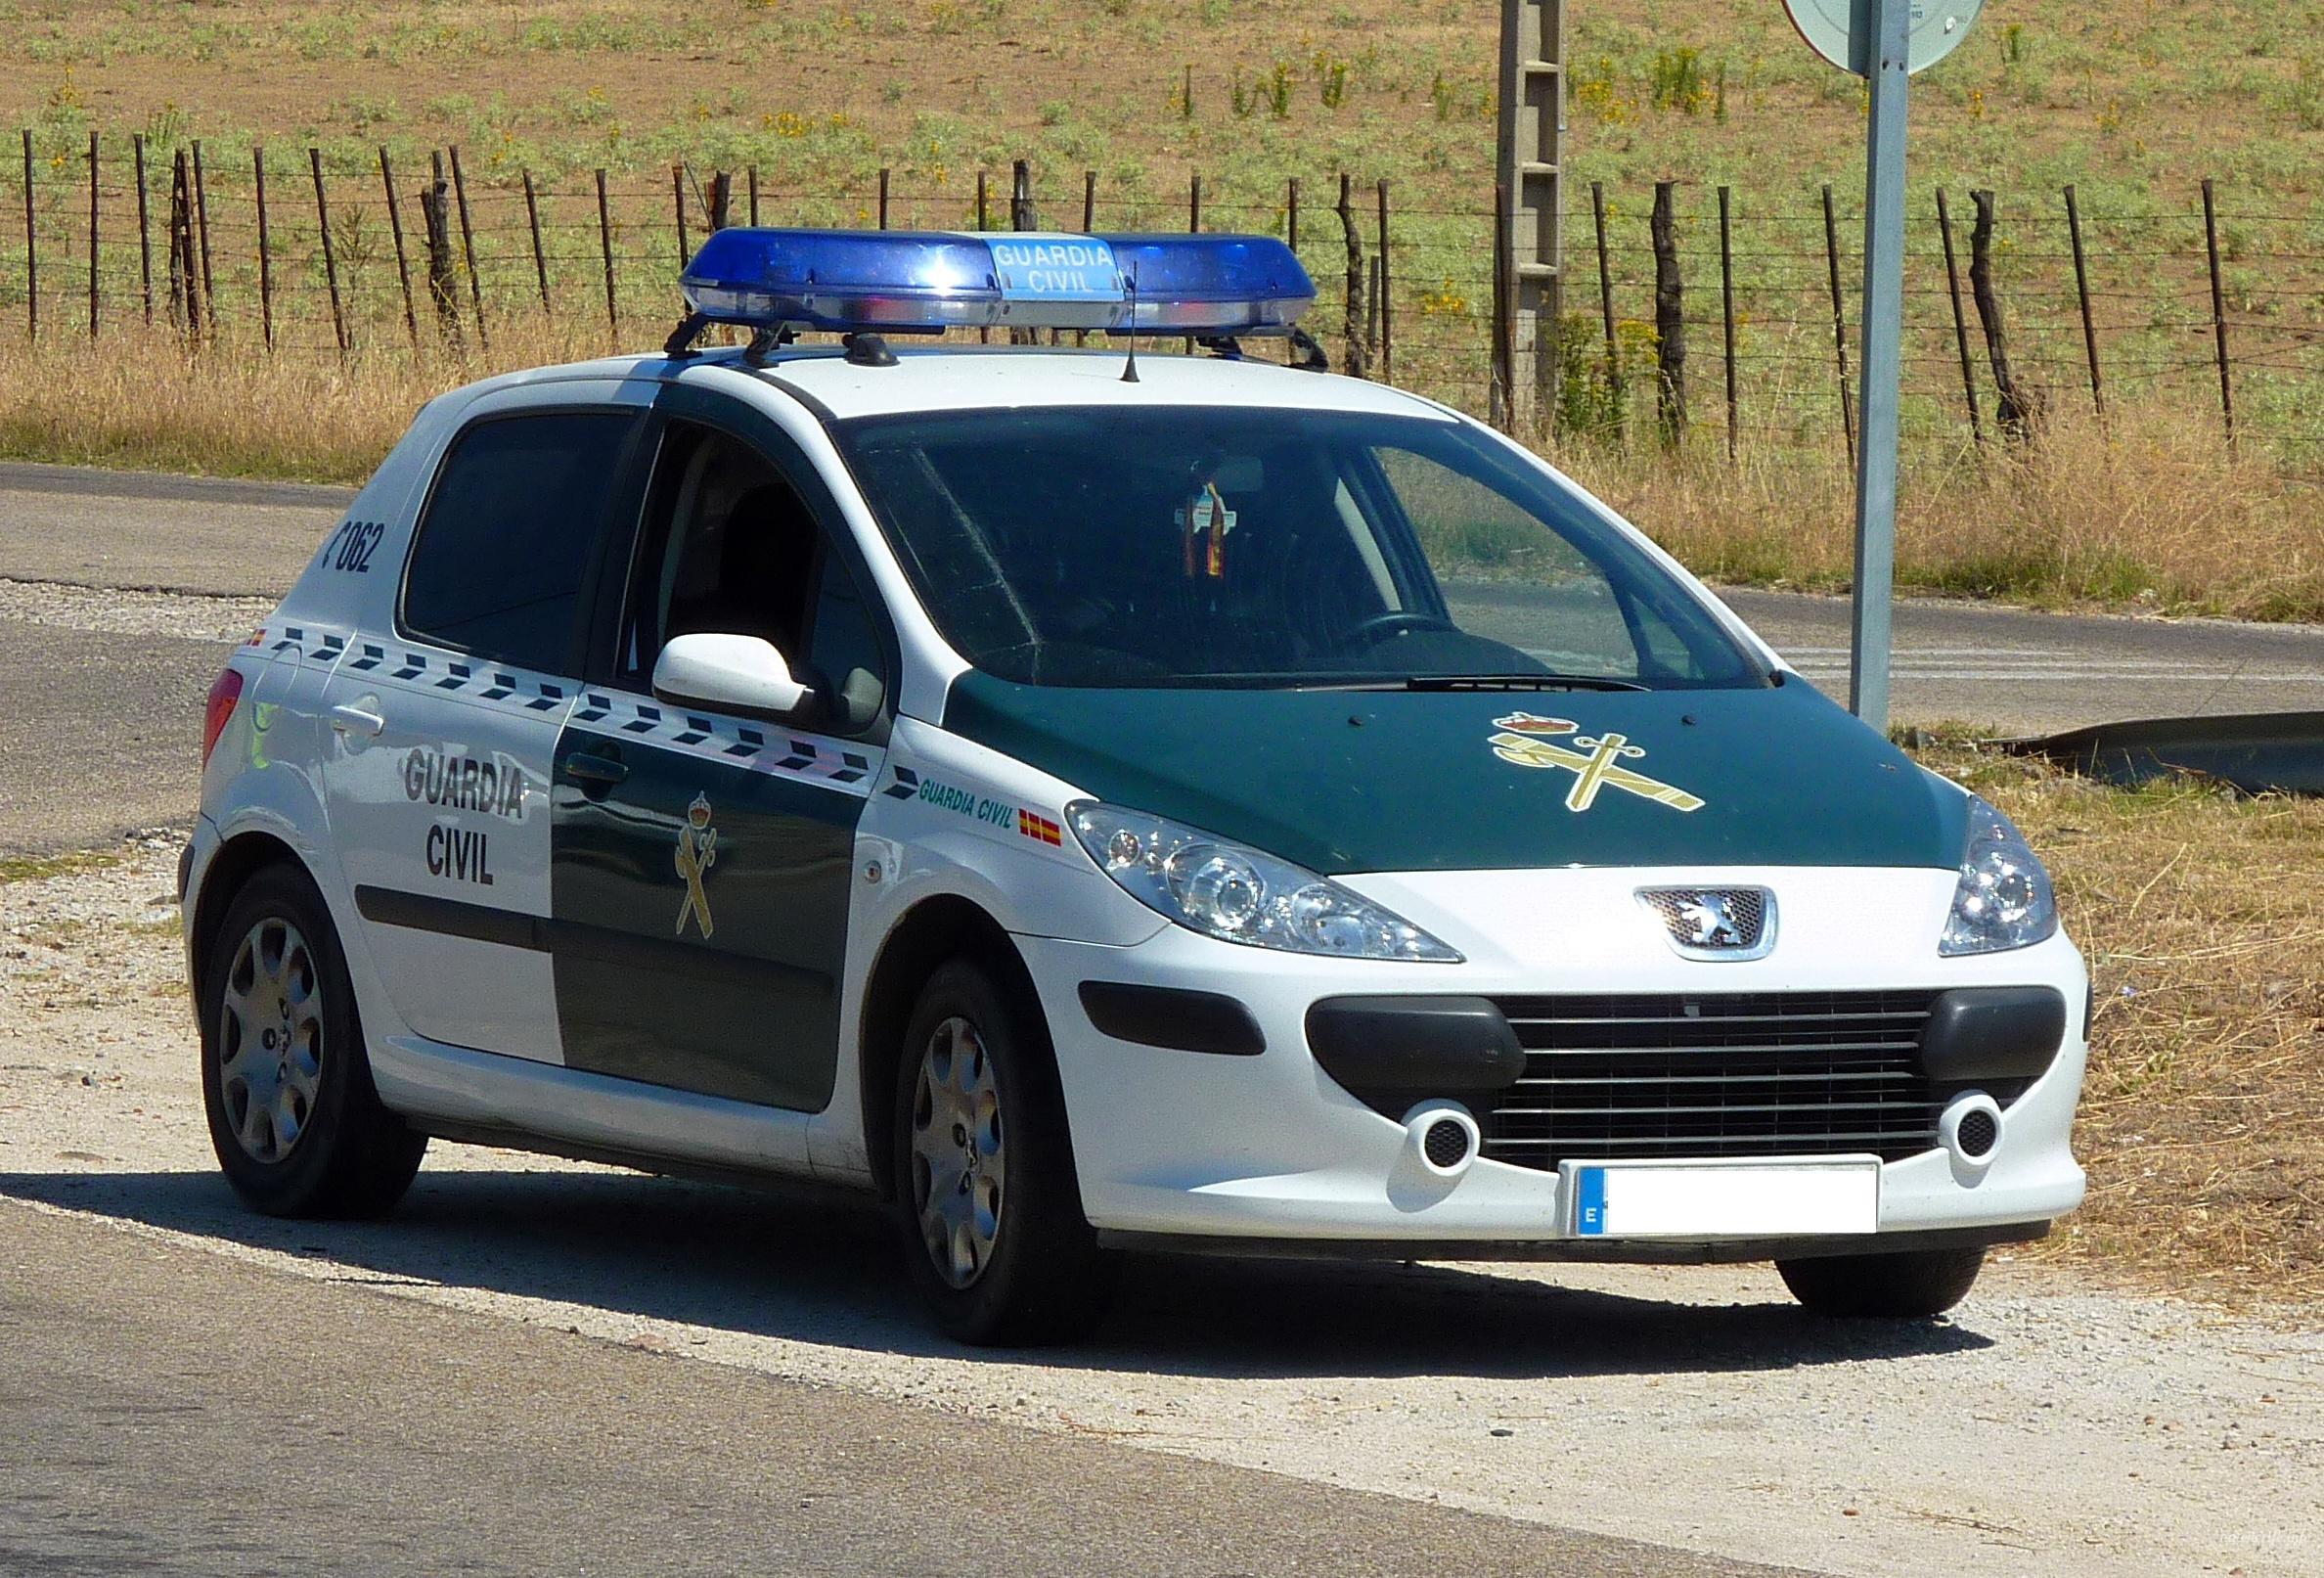 Гражданская гвардия (Guardia Civil) на Тенерифе